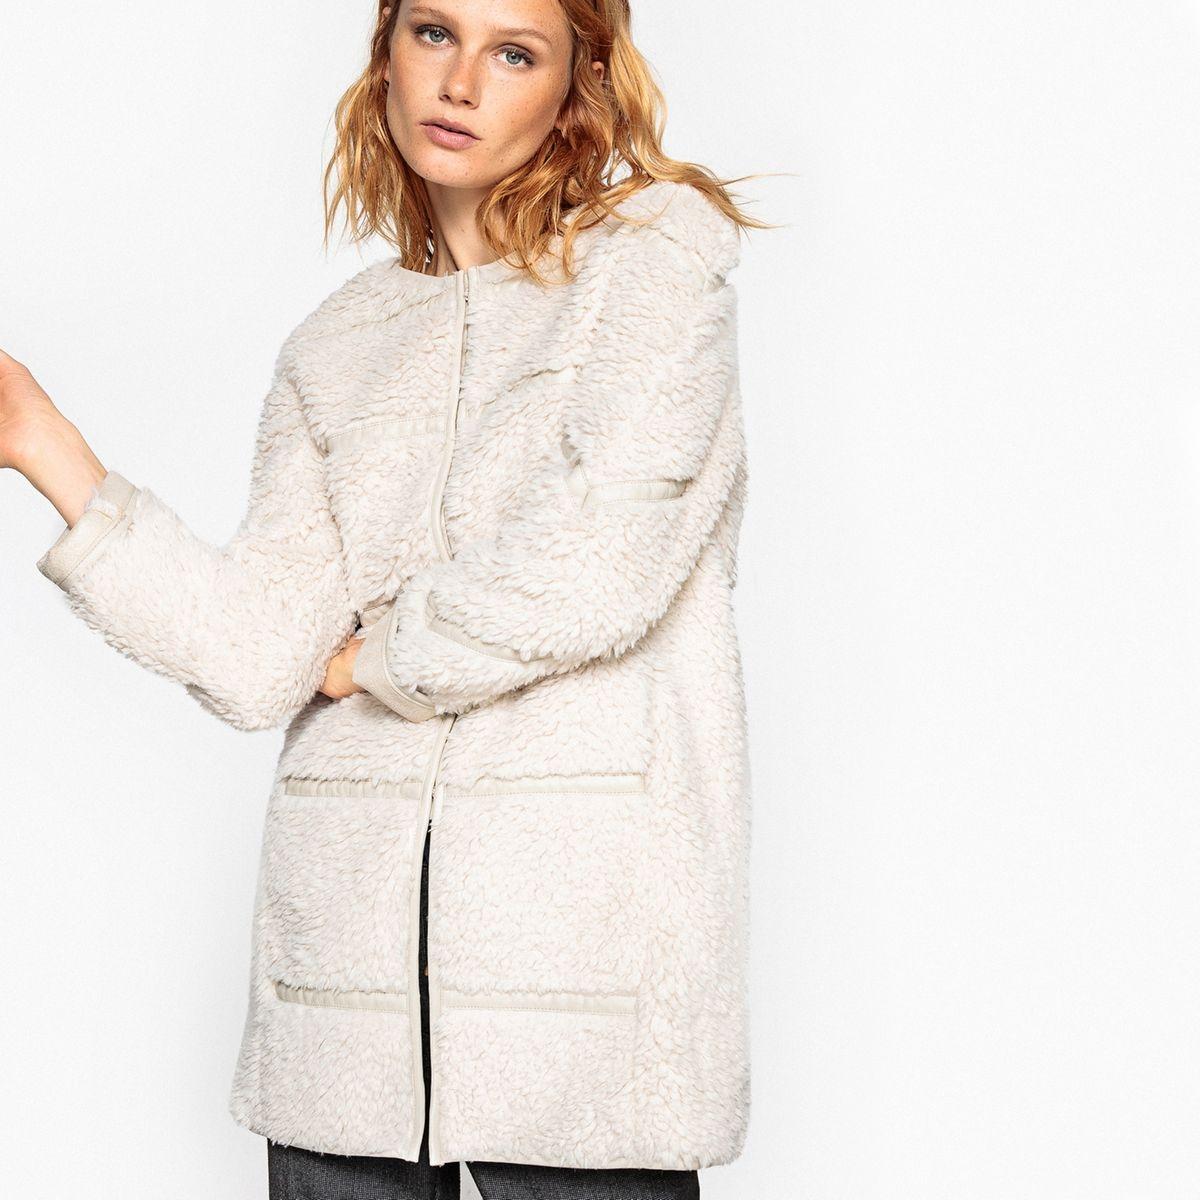 Manteau femme imitation fourrure